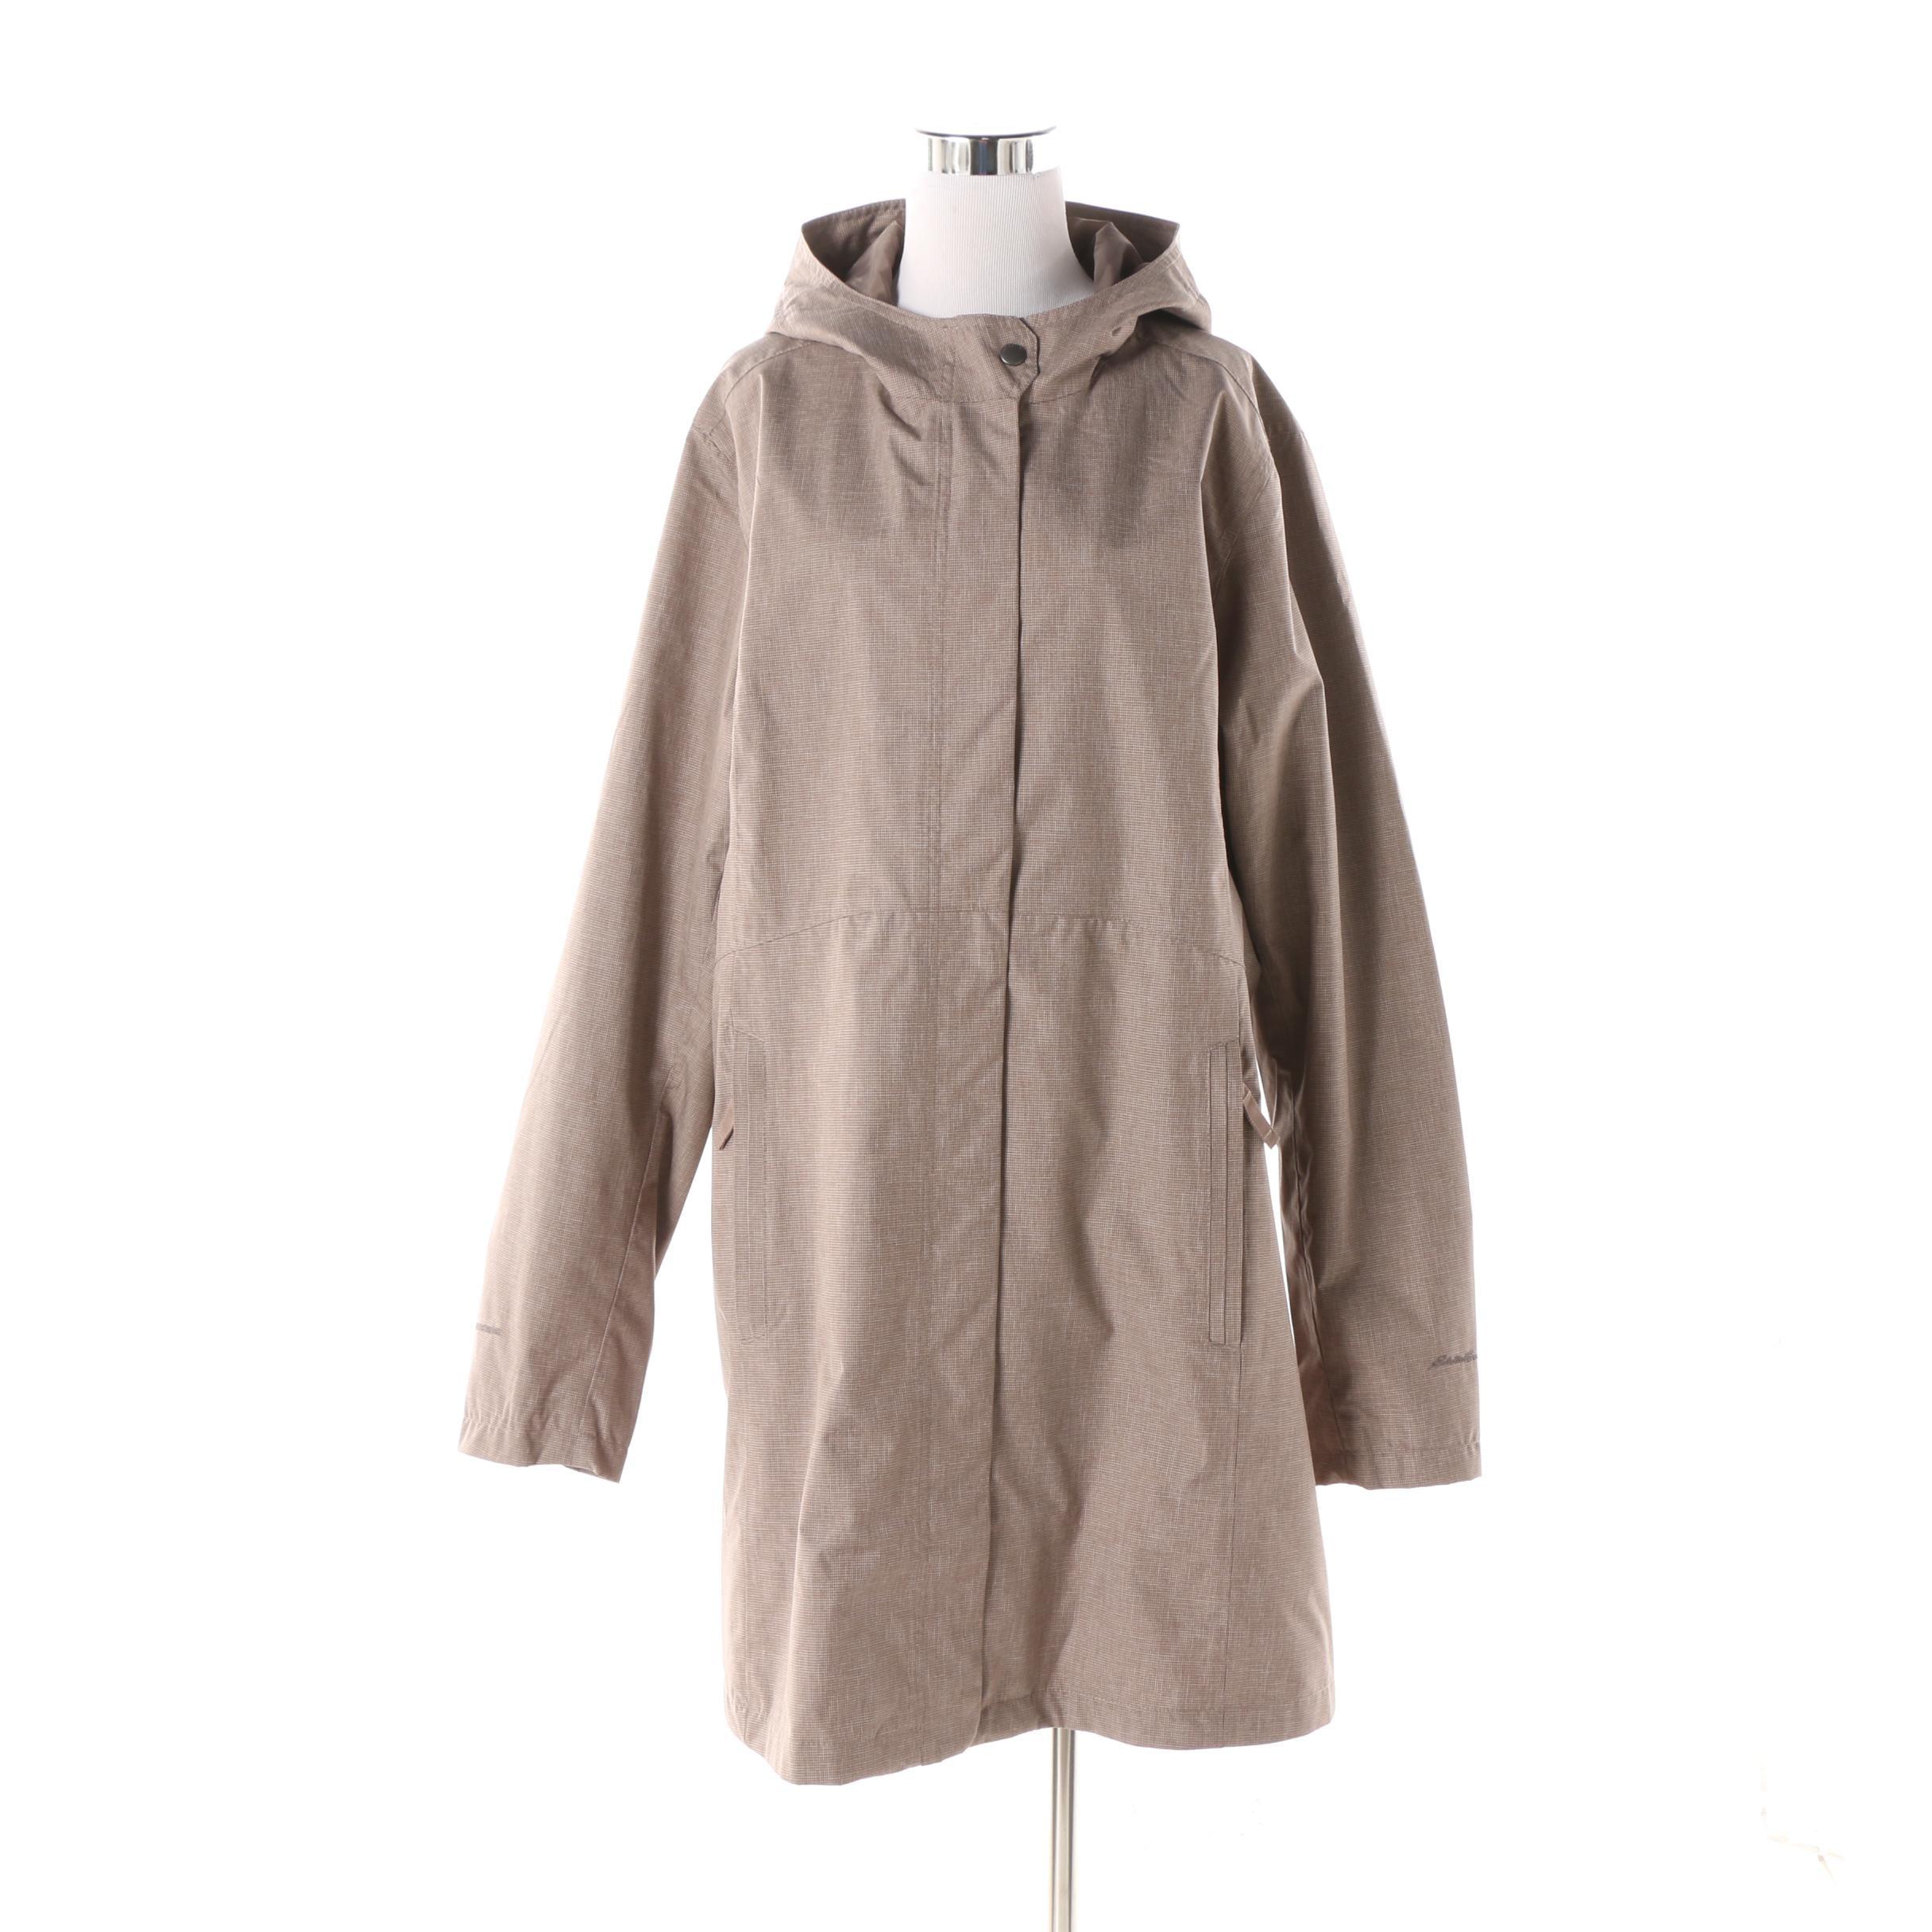 Women's Eddie Bauer WeatherEdge Brown Micro Check Hooded Rain Jacket